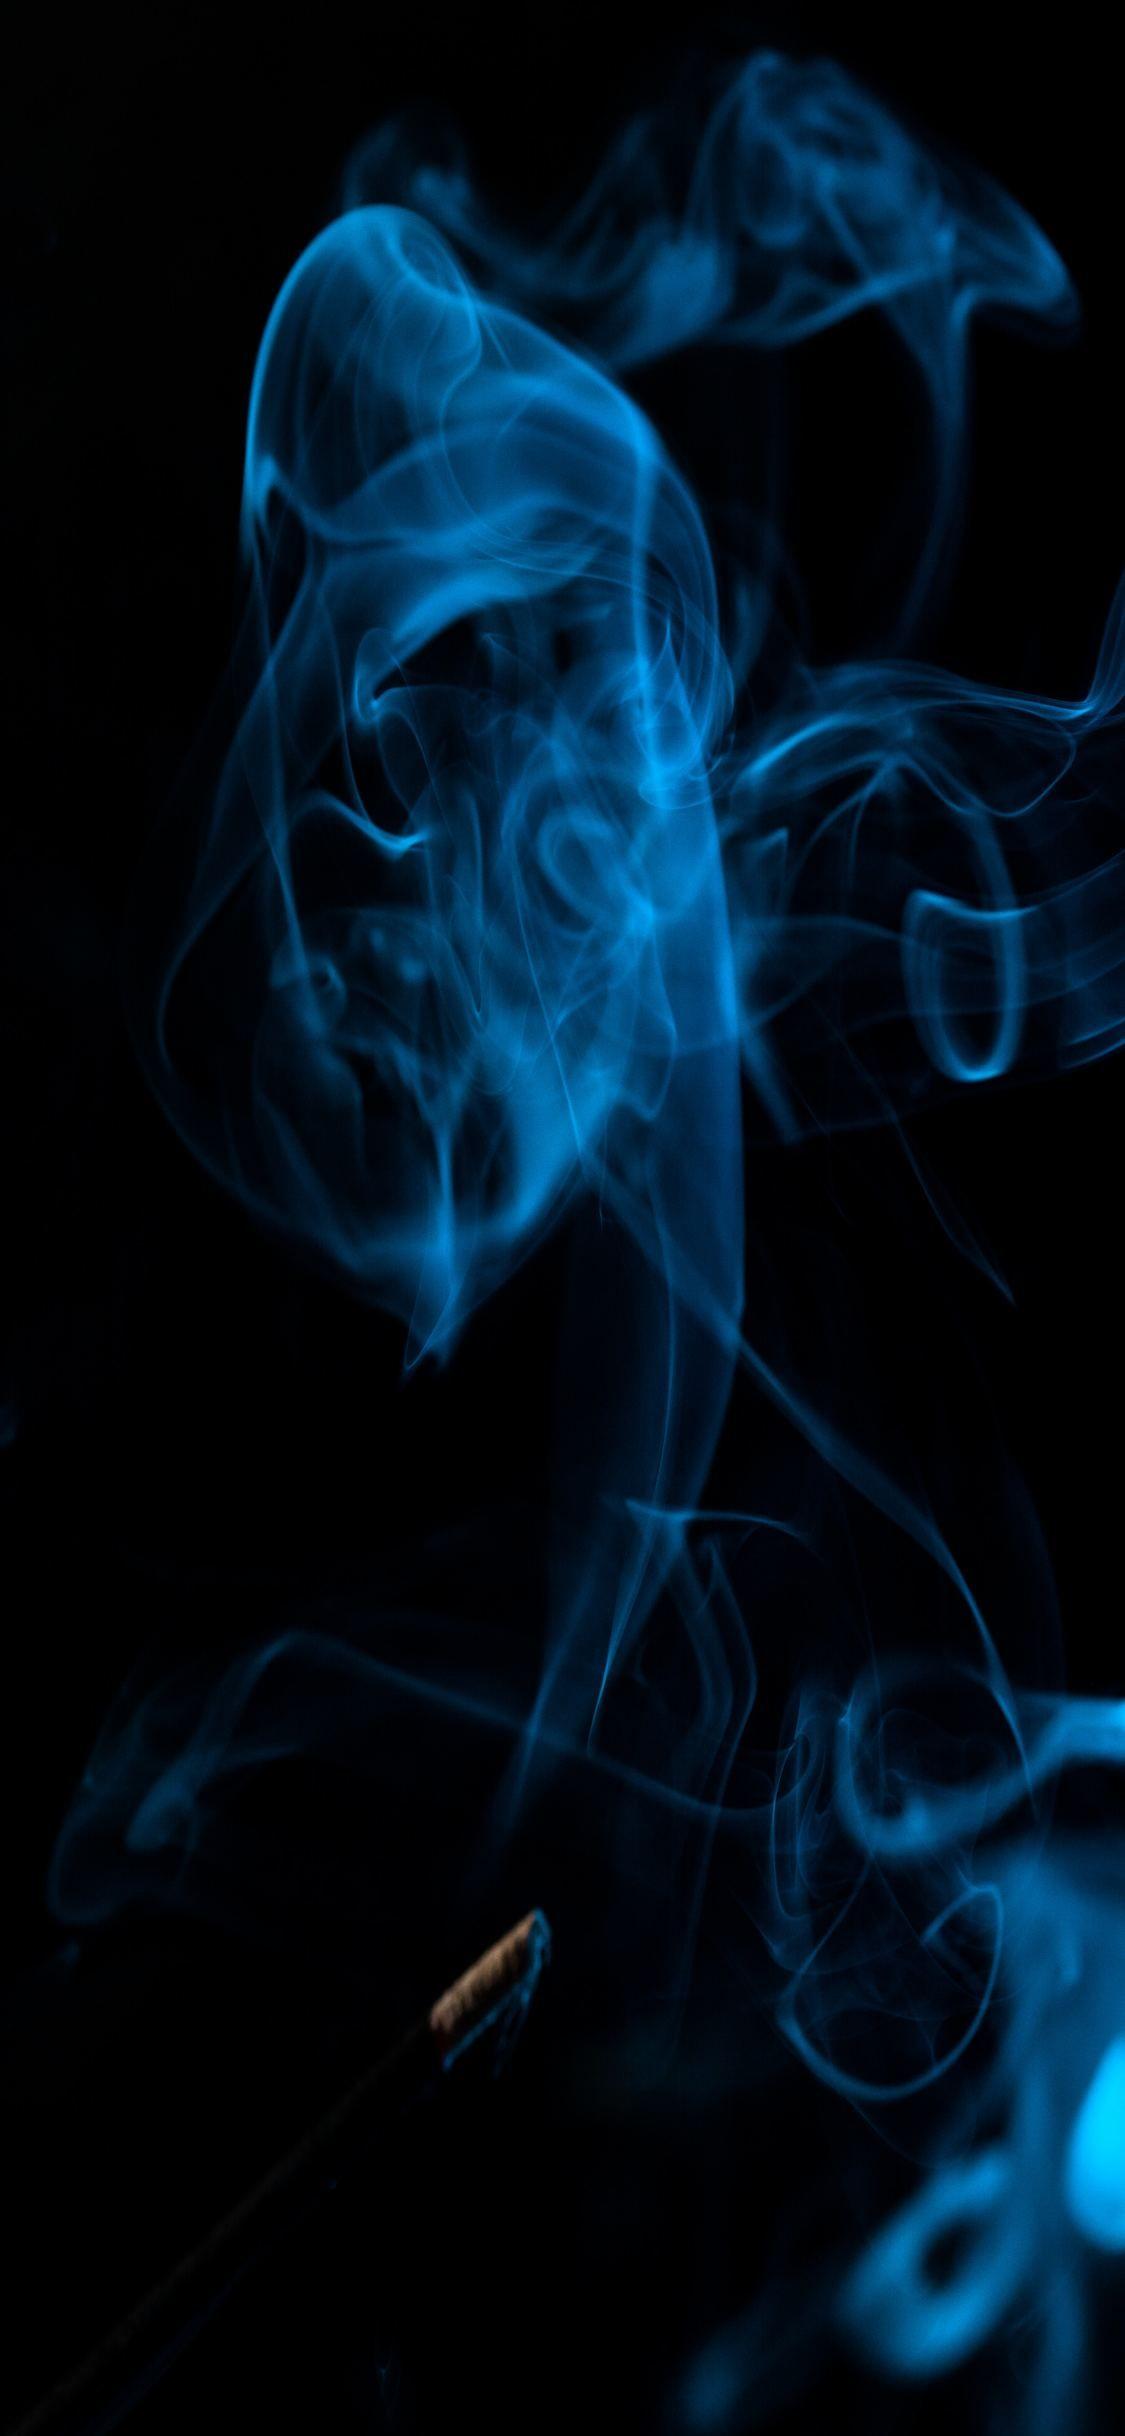 Blue Aesthetic Wallpaper Hd Free Download Smoke Wallpaper Smoke Background Aesthetic Wallpapers